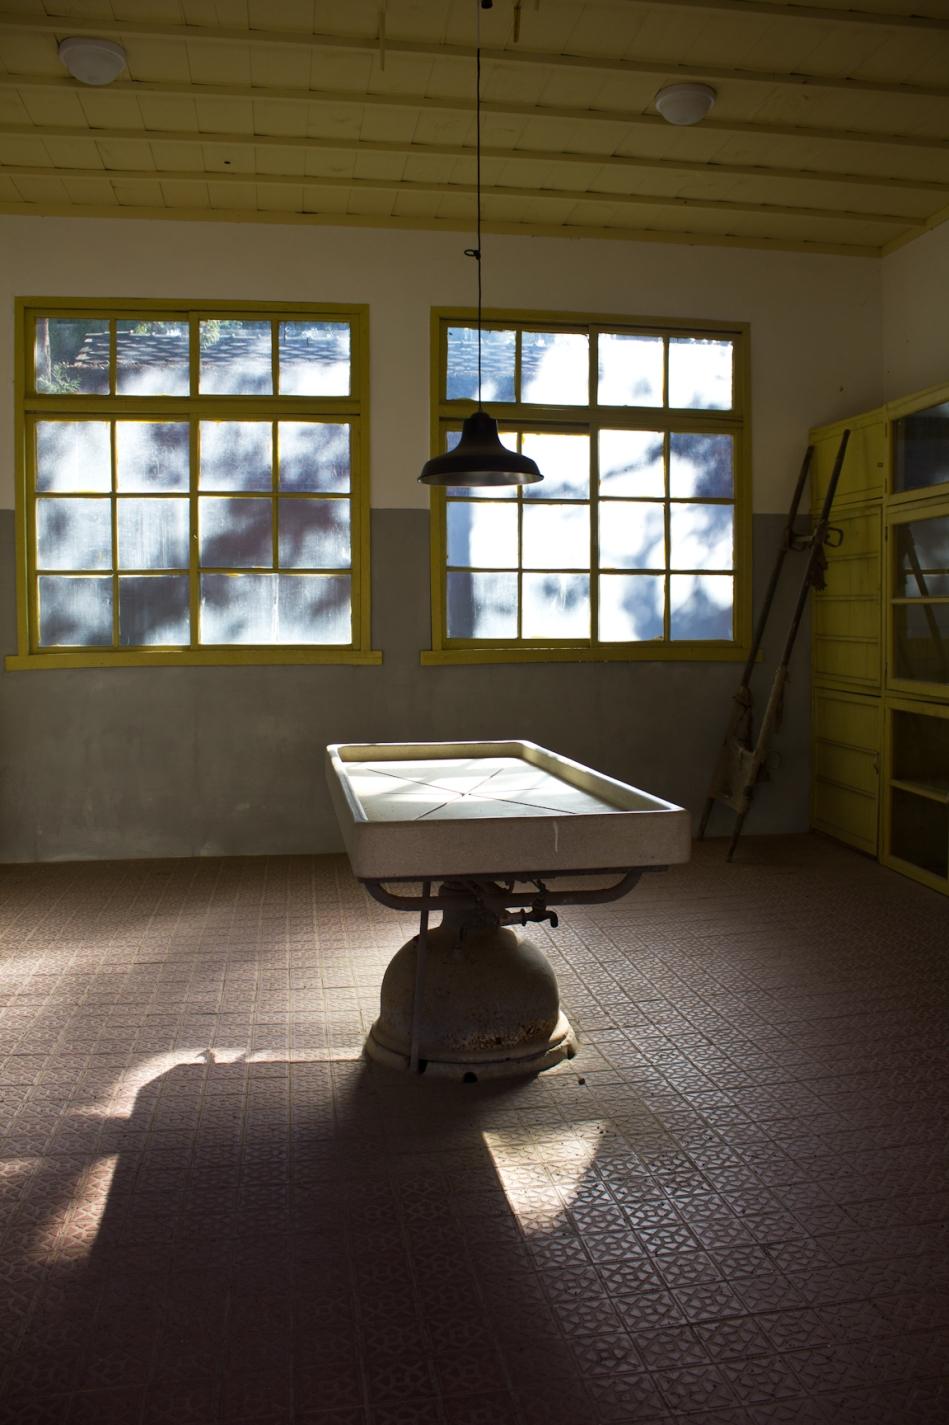 sorokdo autopsy table